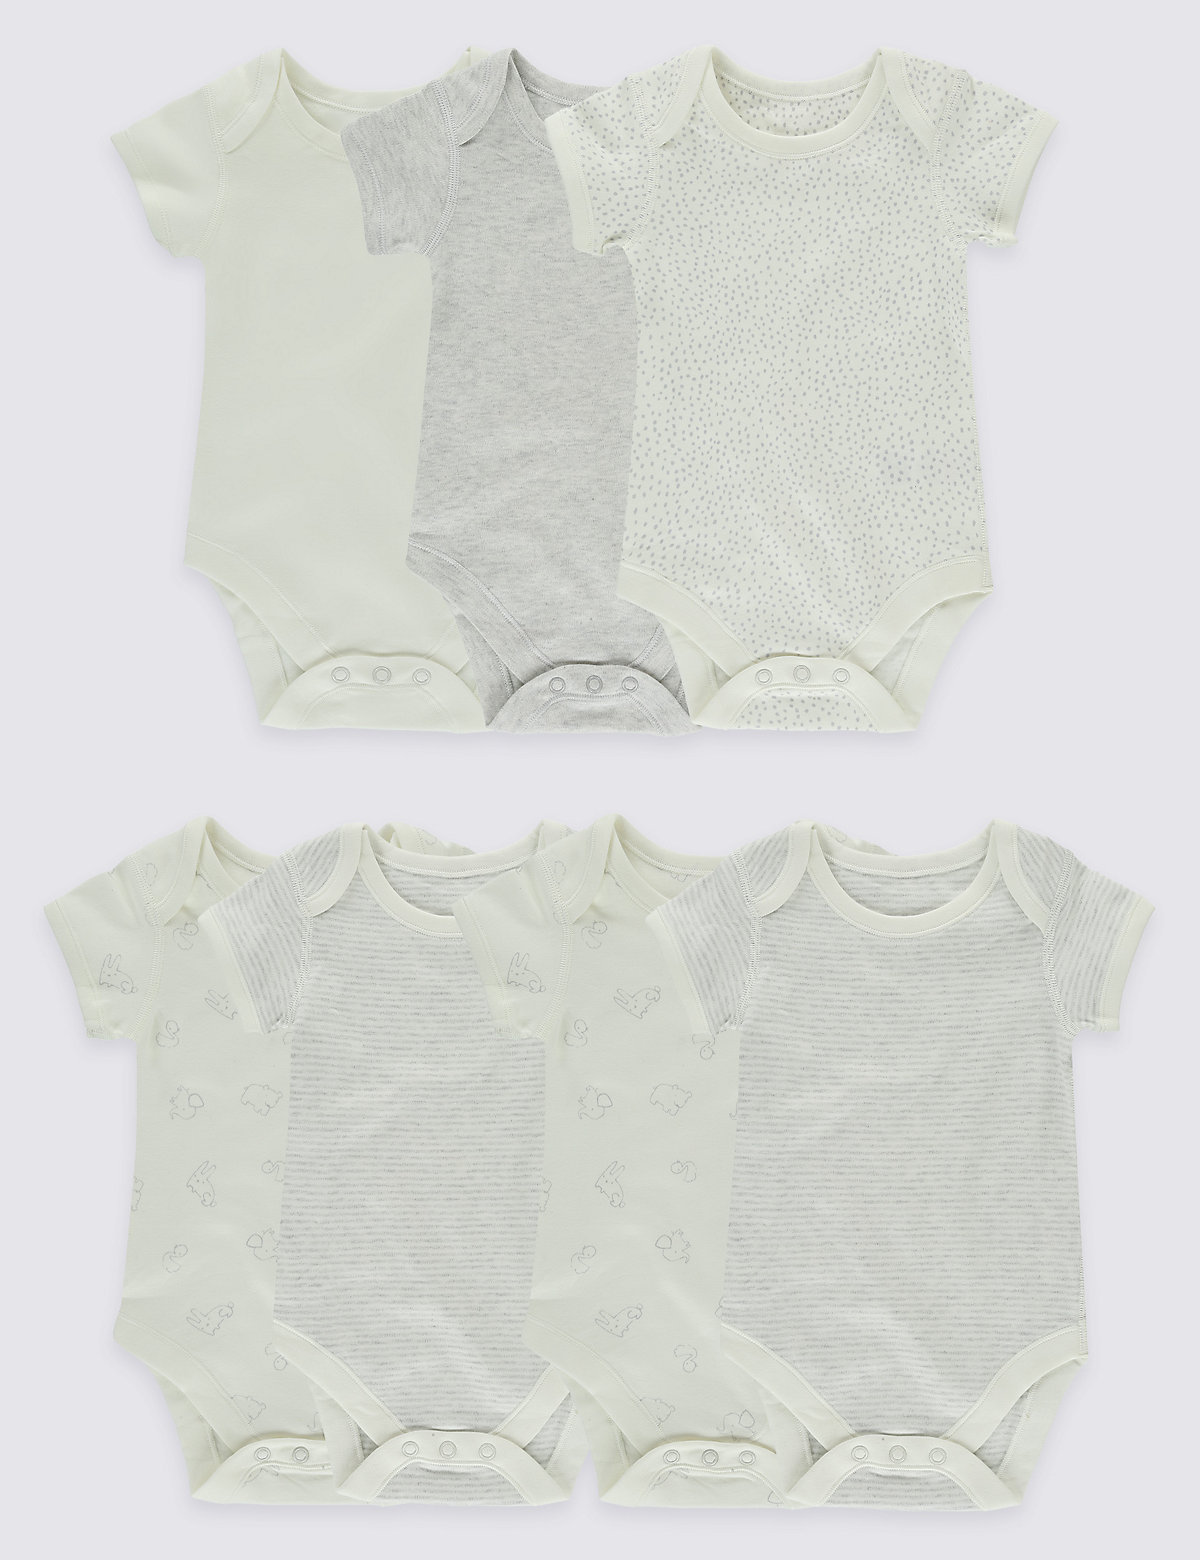 7 Pack Pure Cotton Flat Seams Bodysuits